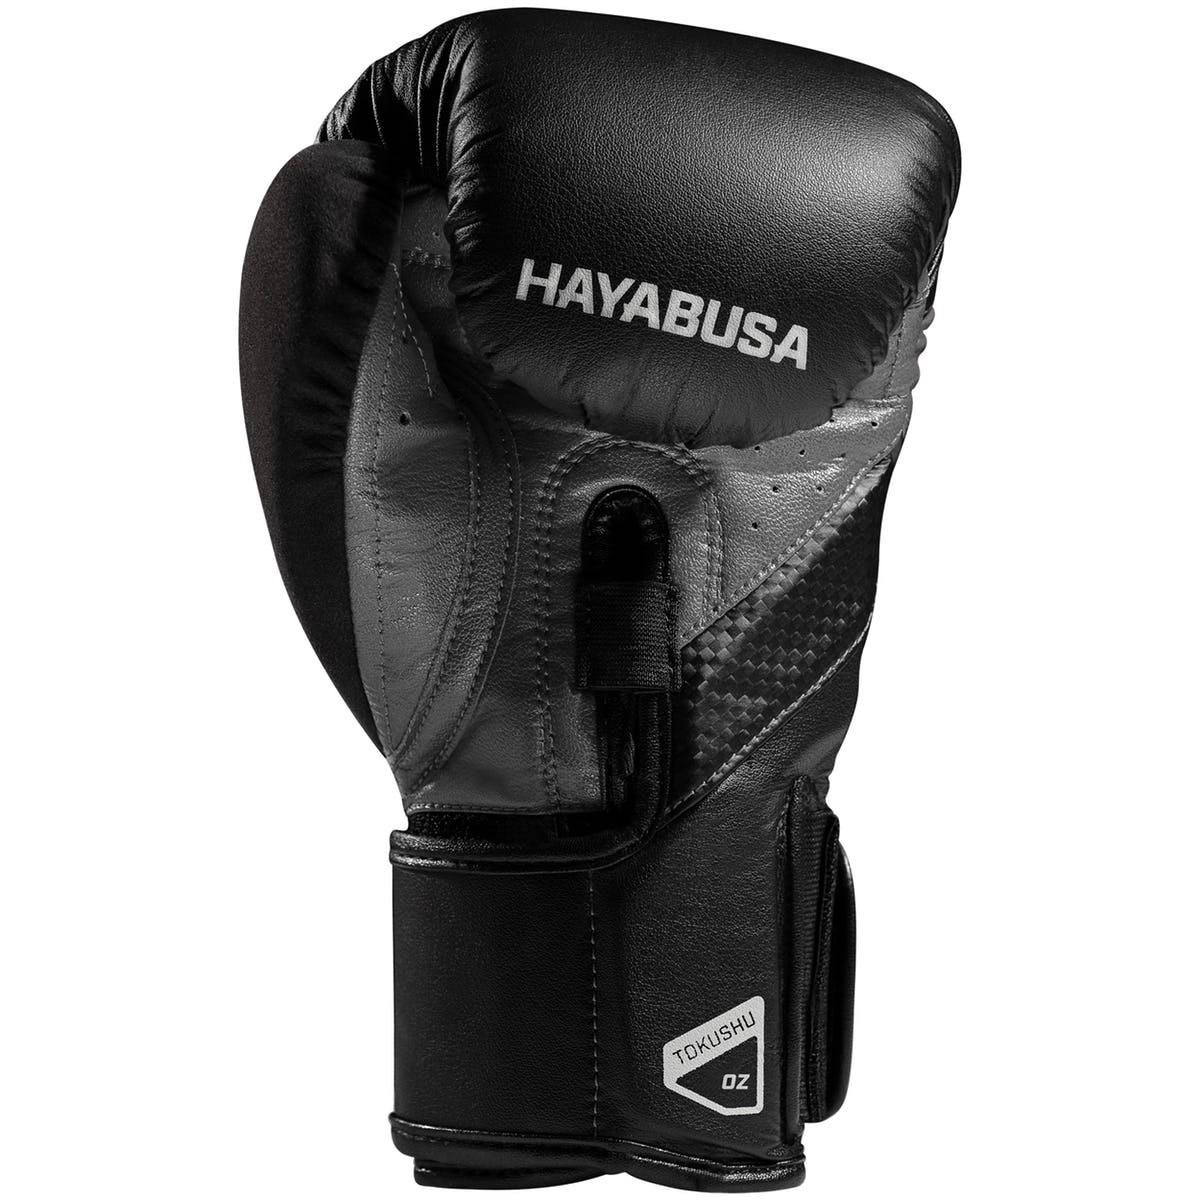 Hayabusa-T3-Dual-X-Hook-and-Loop-Closure-Vylar-Leather-Training-Boxing-Gloves thumbnail 9